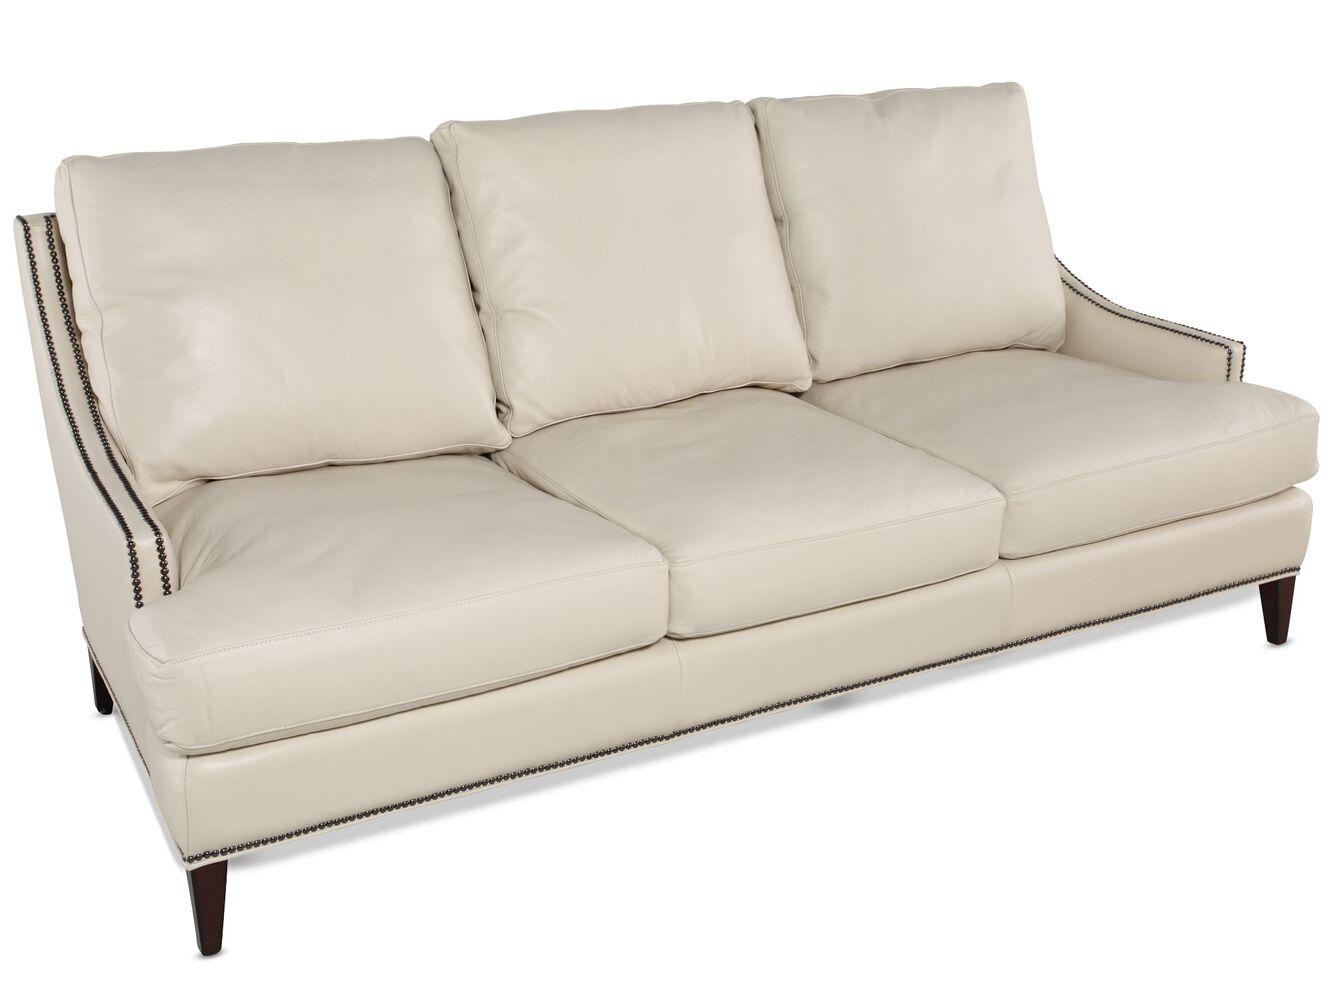 Henredon Leather Sofa Mathis Brothers Furniture